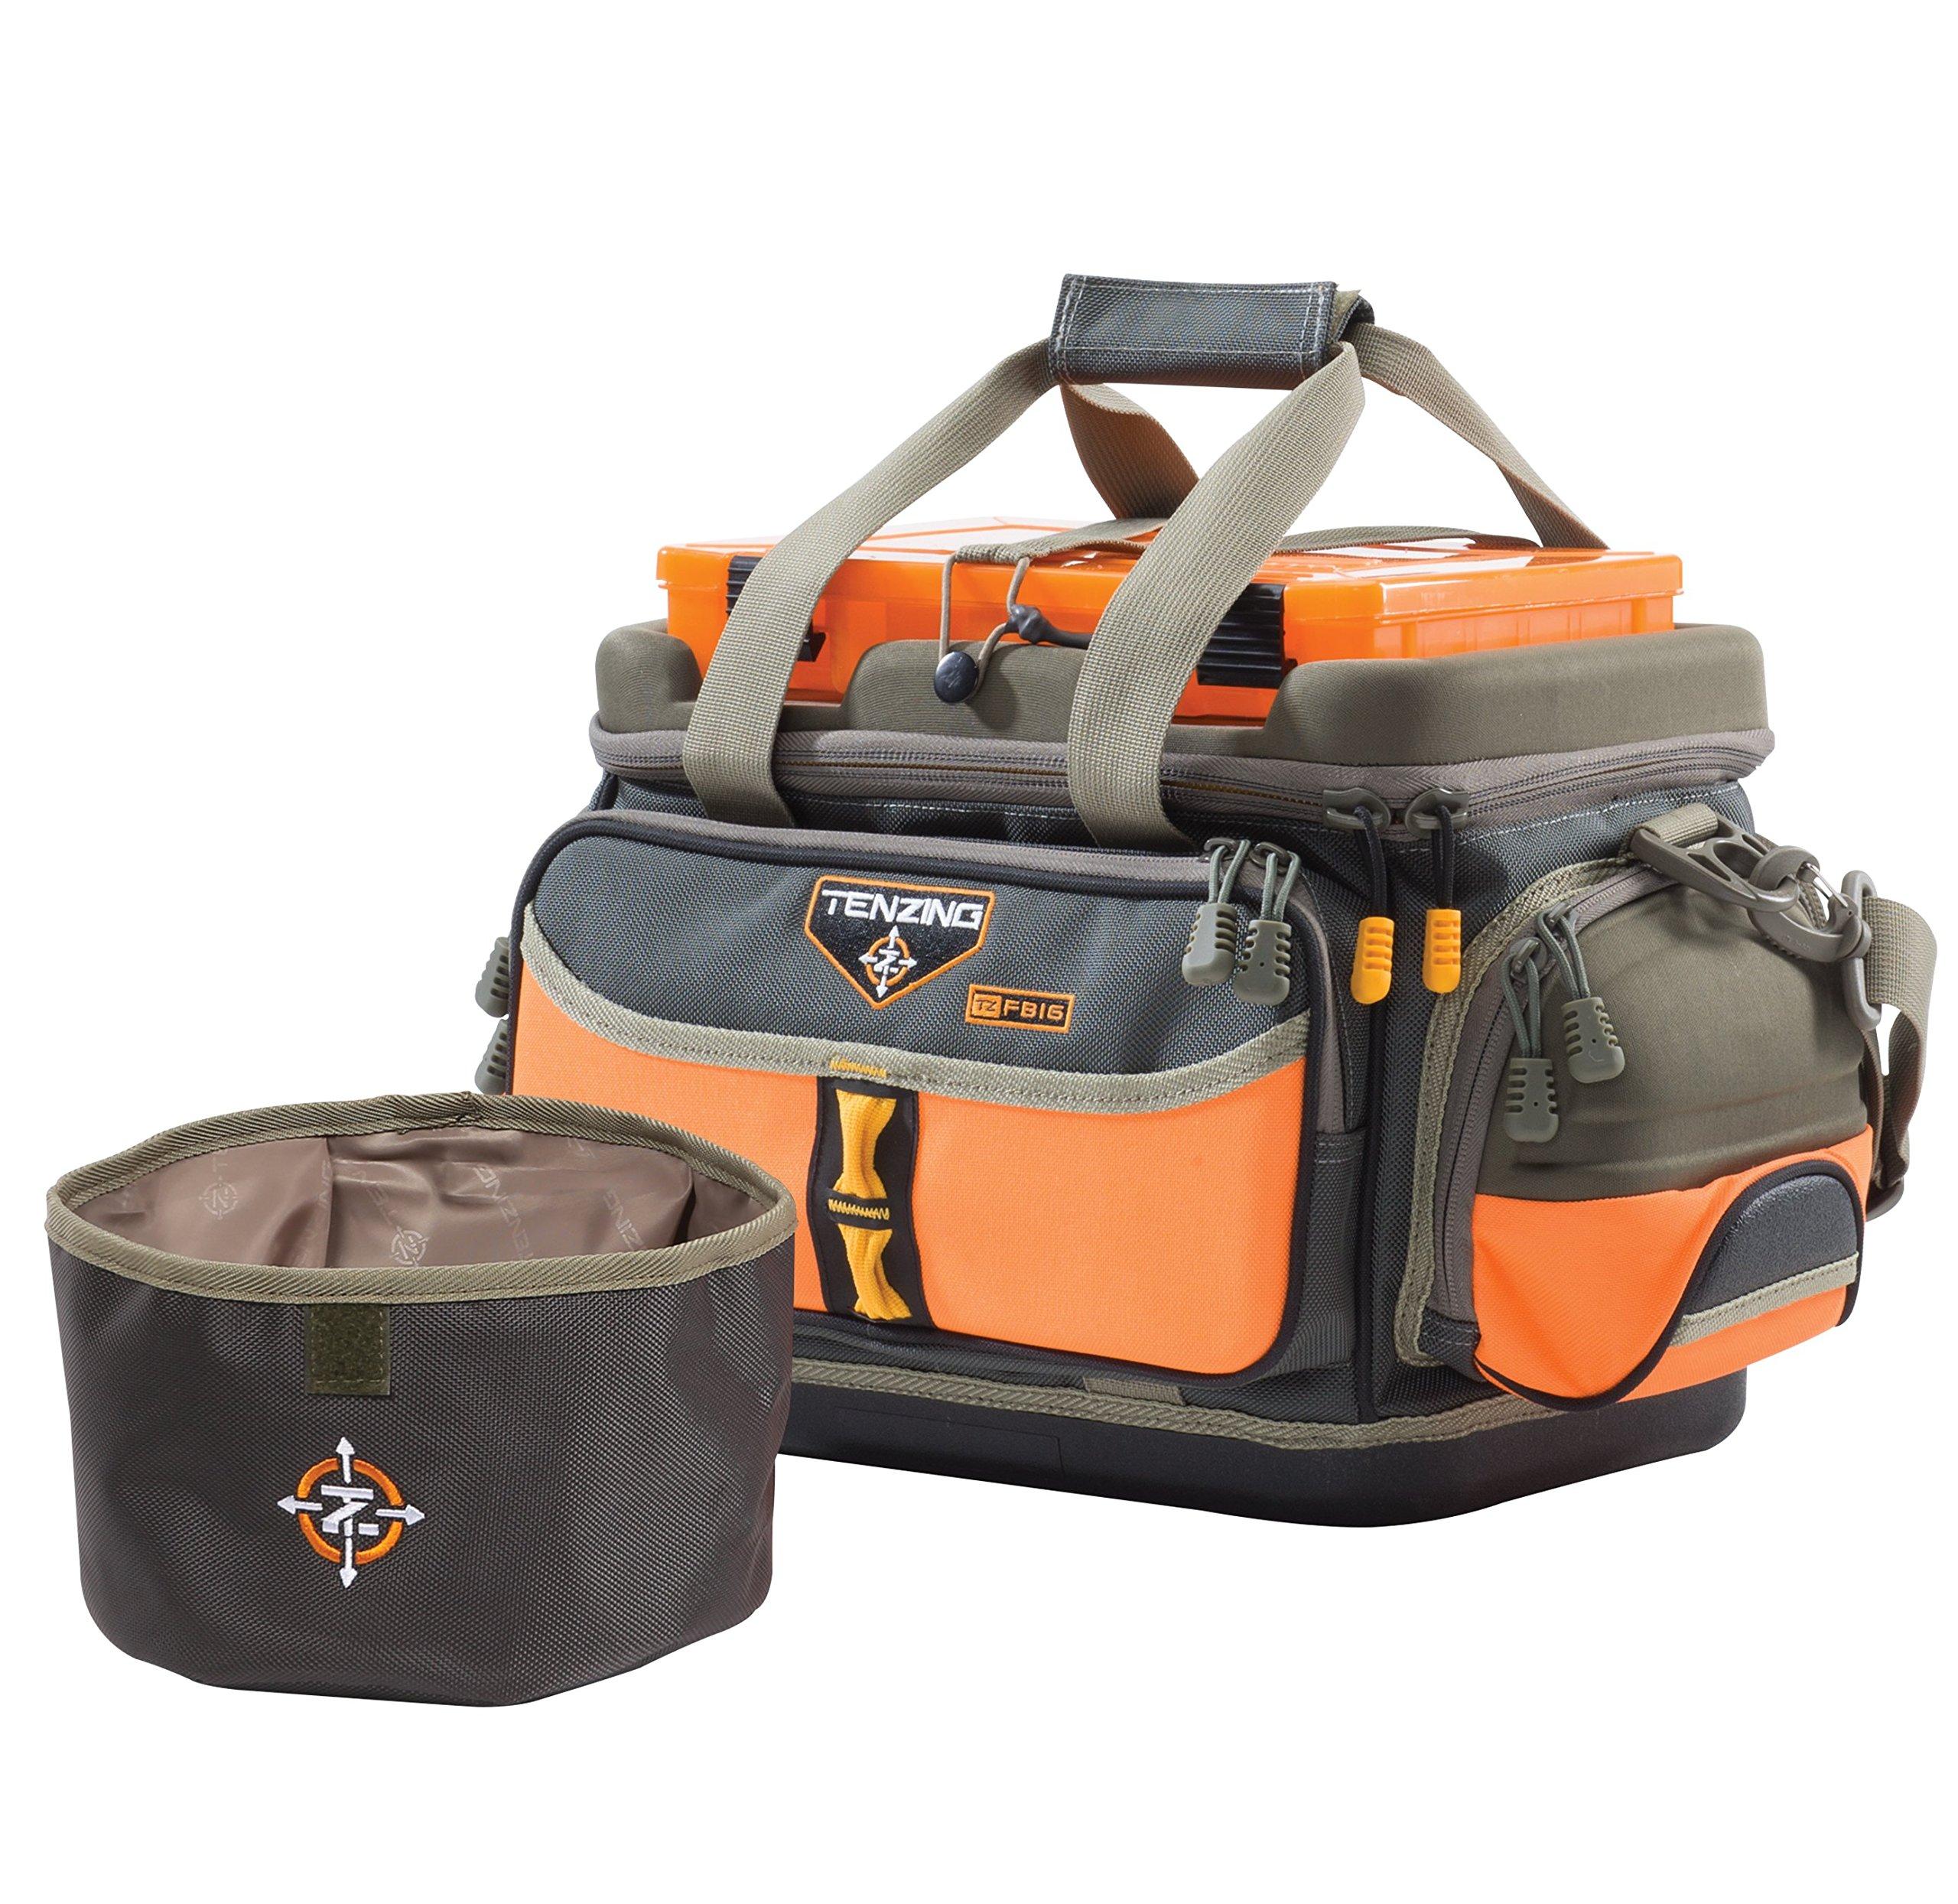 Tenzing TZ UPSBB Upland Field Bag, Blaze Orange by Tenzing (Image #1)